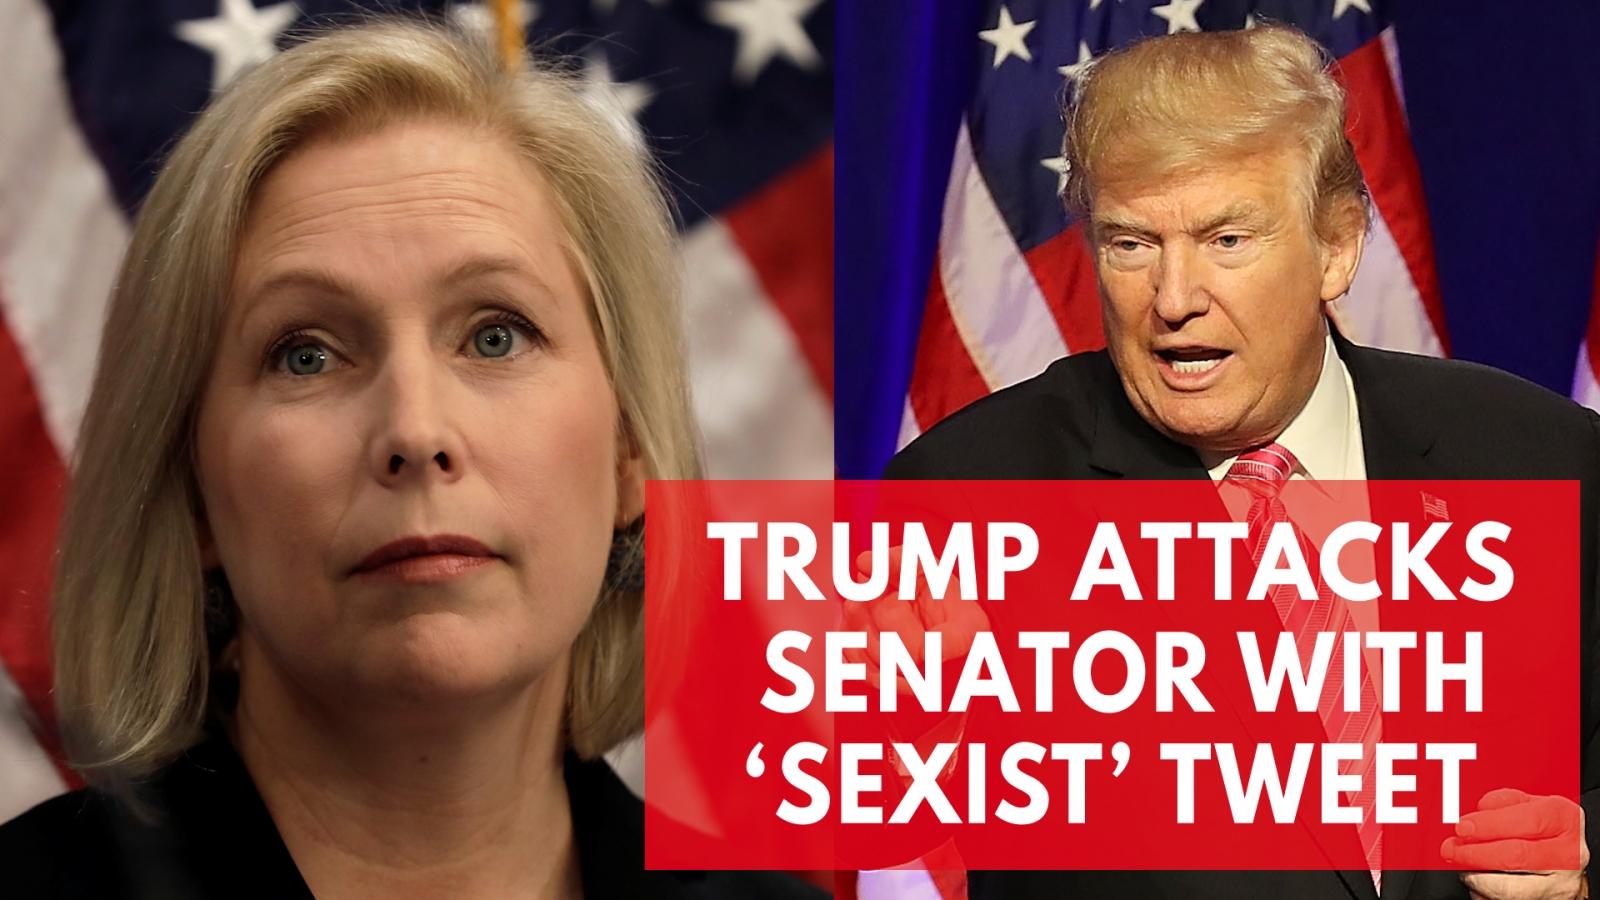 US Senator calls President Trump's tweet a 'sexist smear'